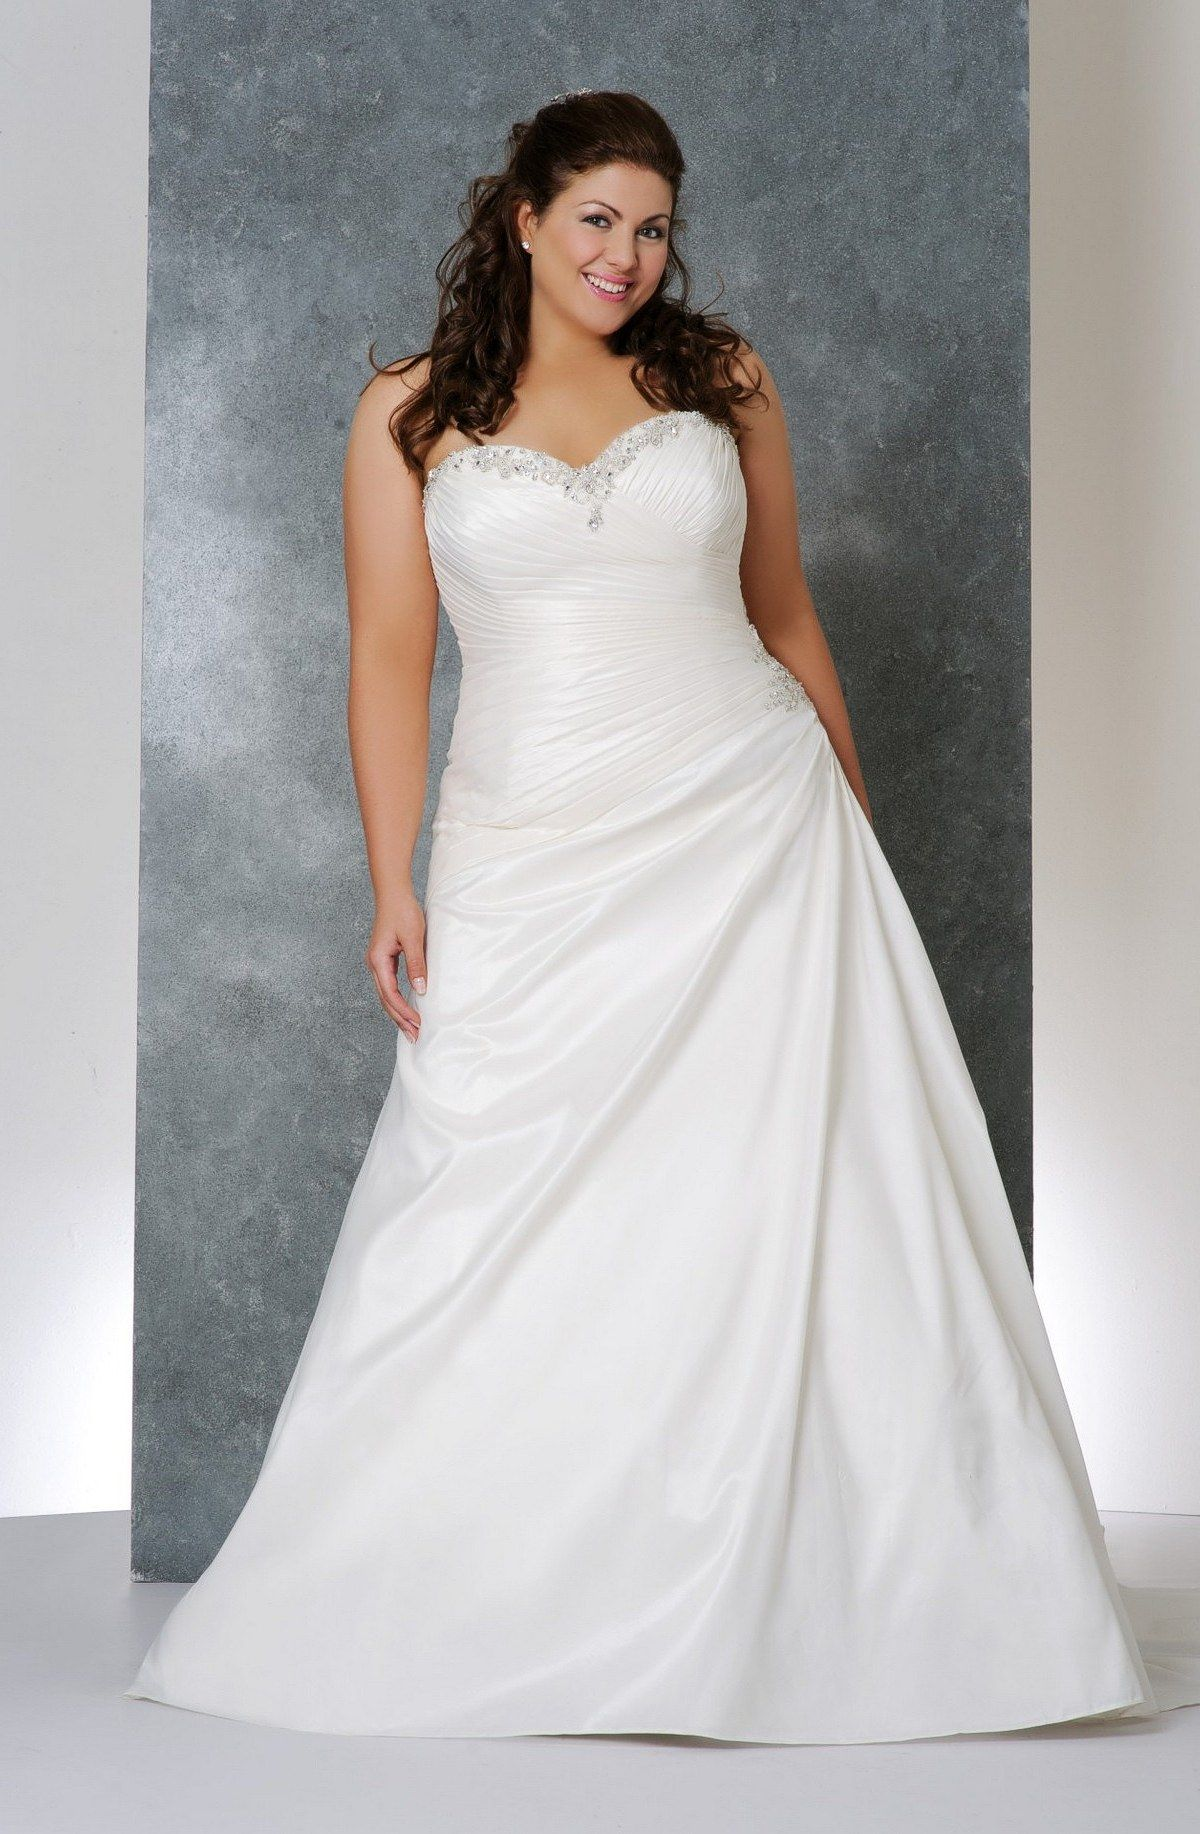 10 dicas para vestidos de noiva plus size | Weddings | Pinterest